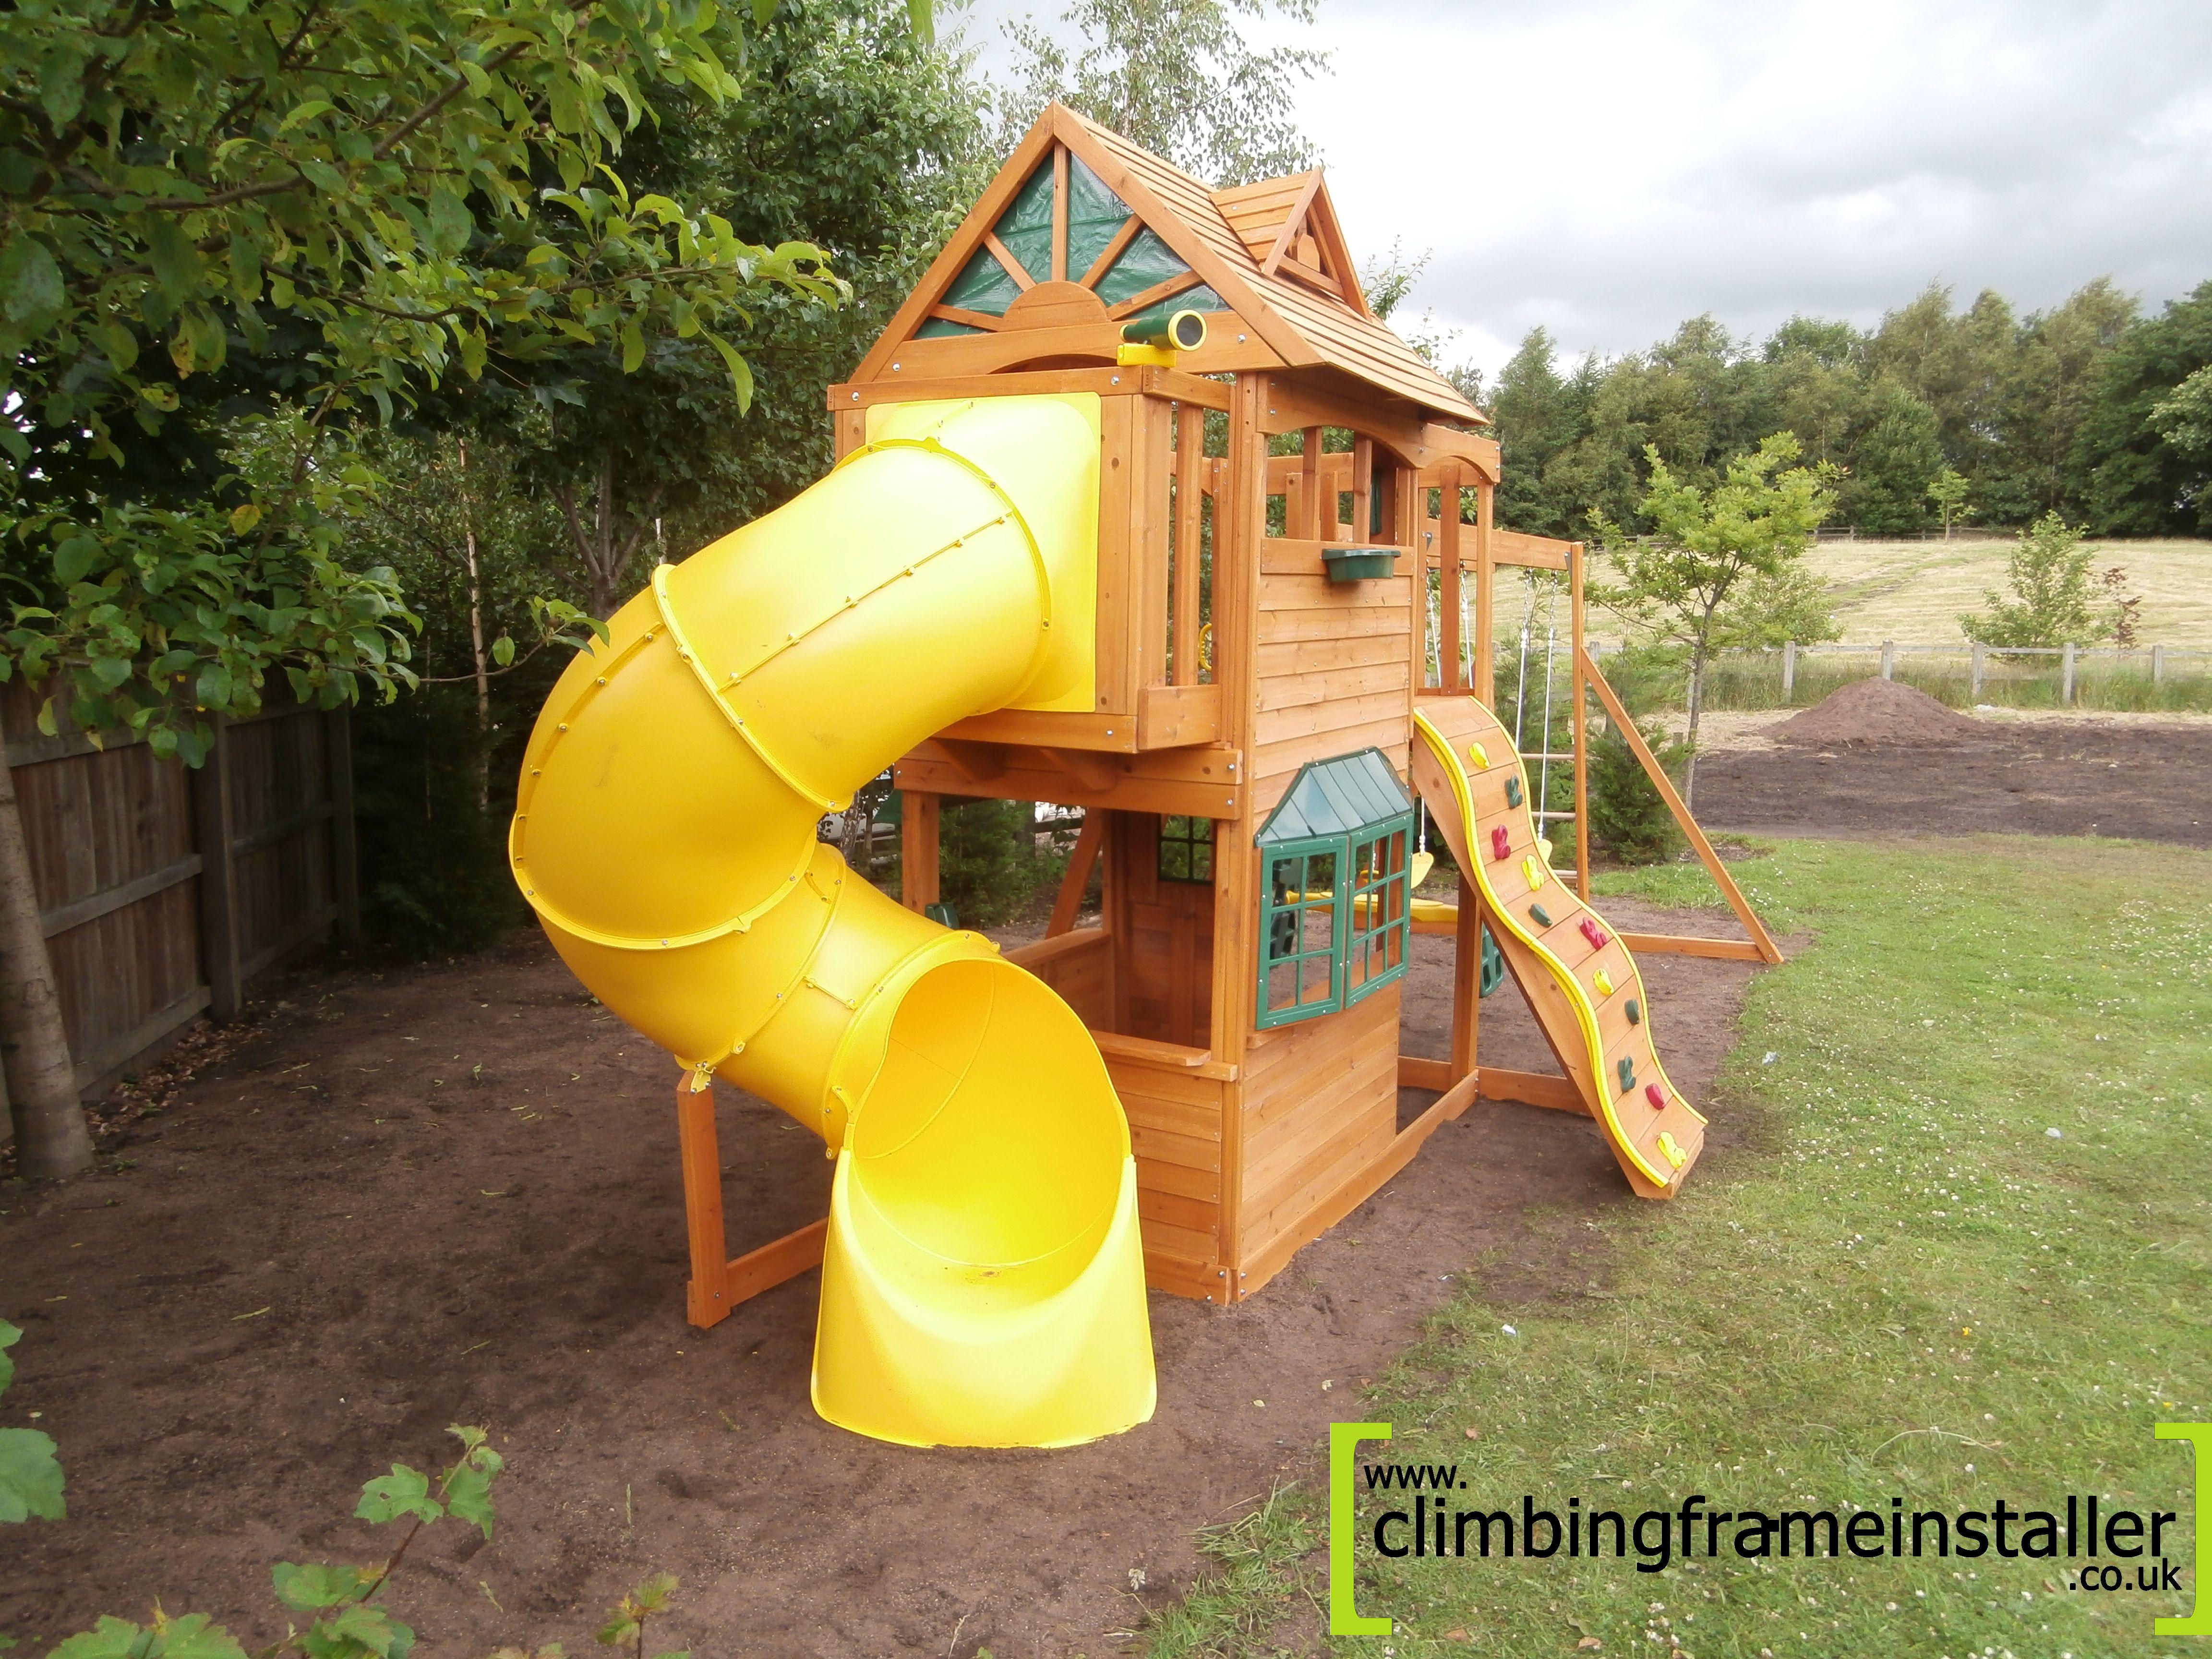 Selwood Sandpoint Wooden Climbing Frame Climbing Frame Installer